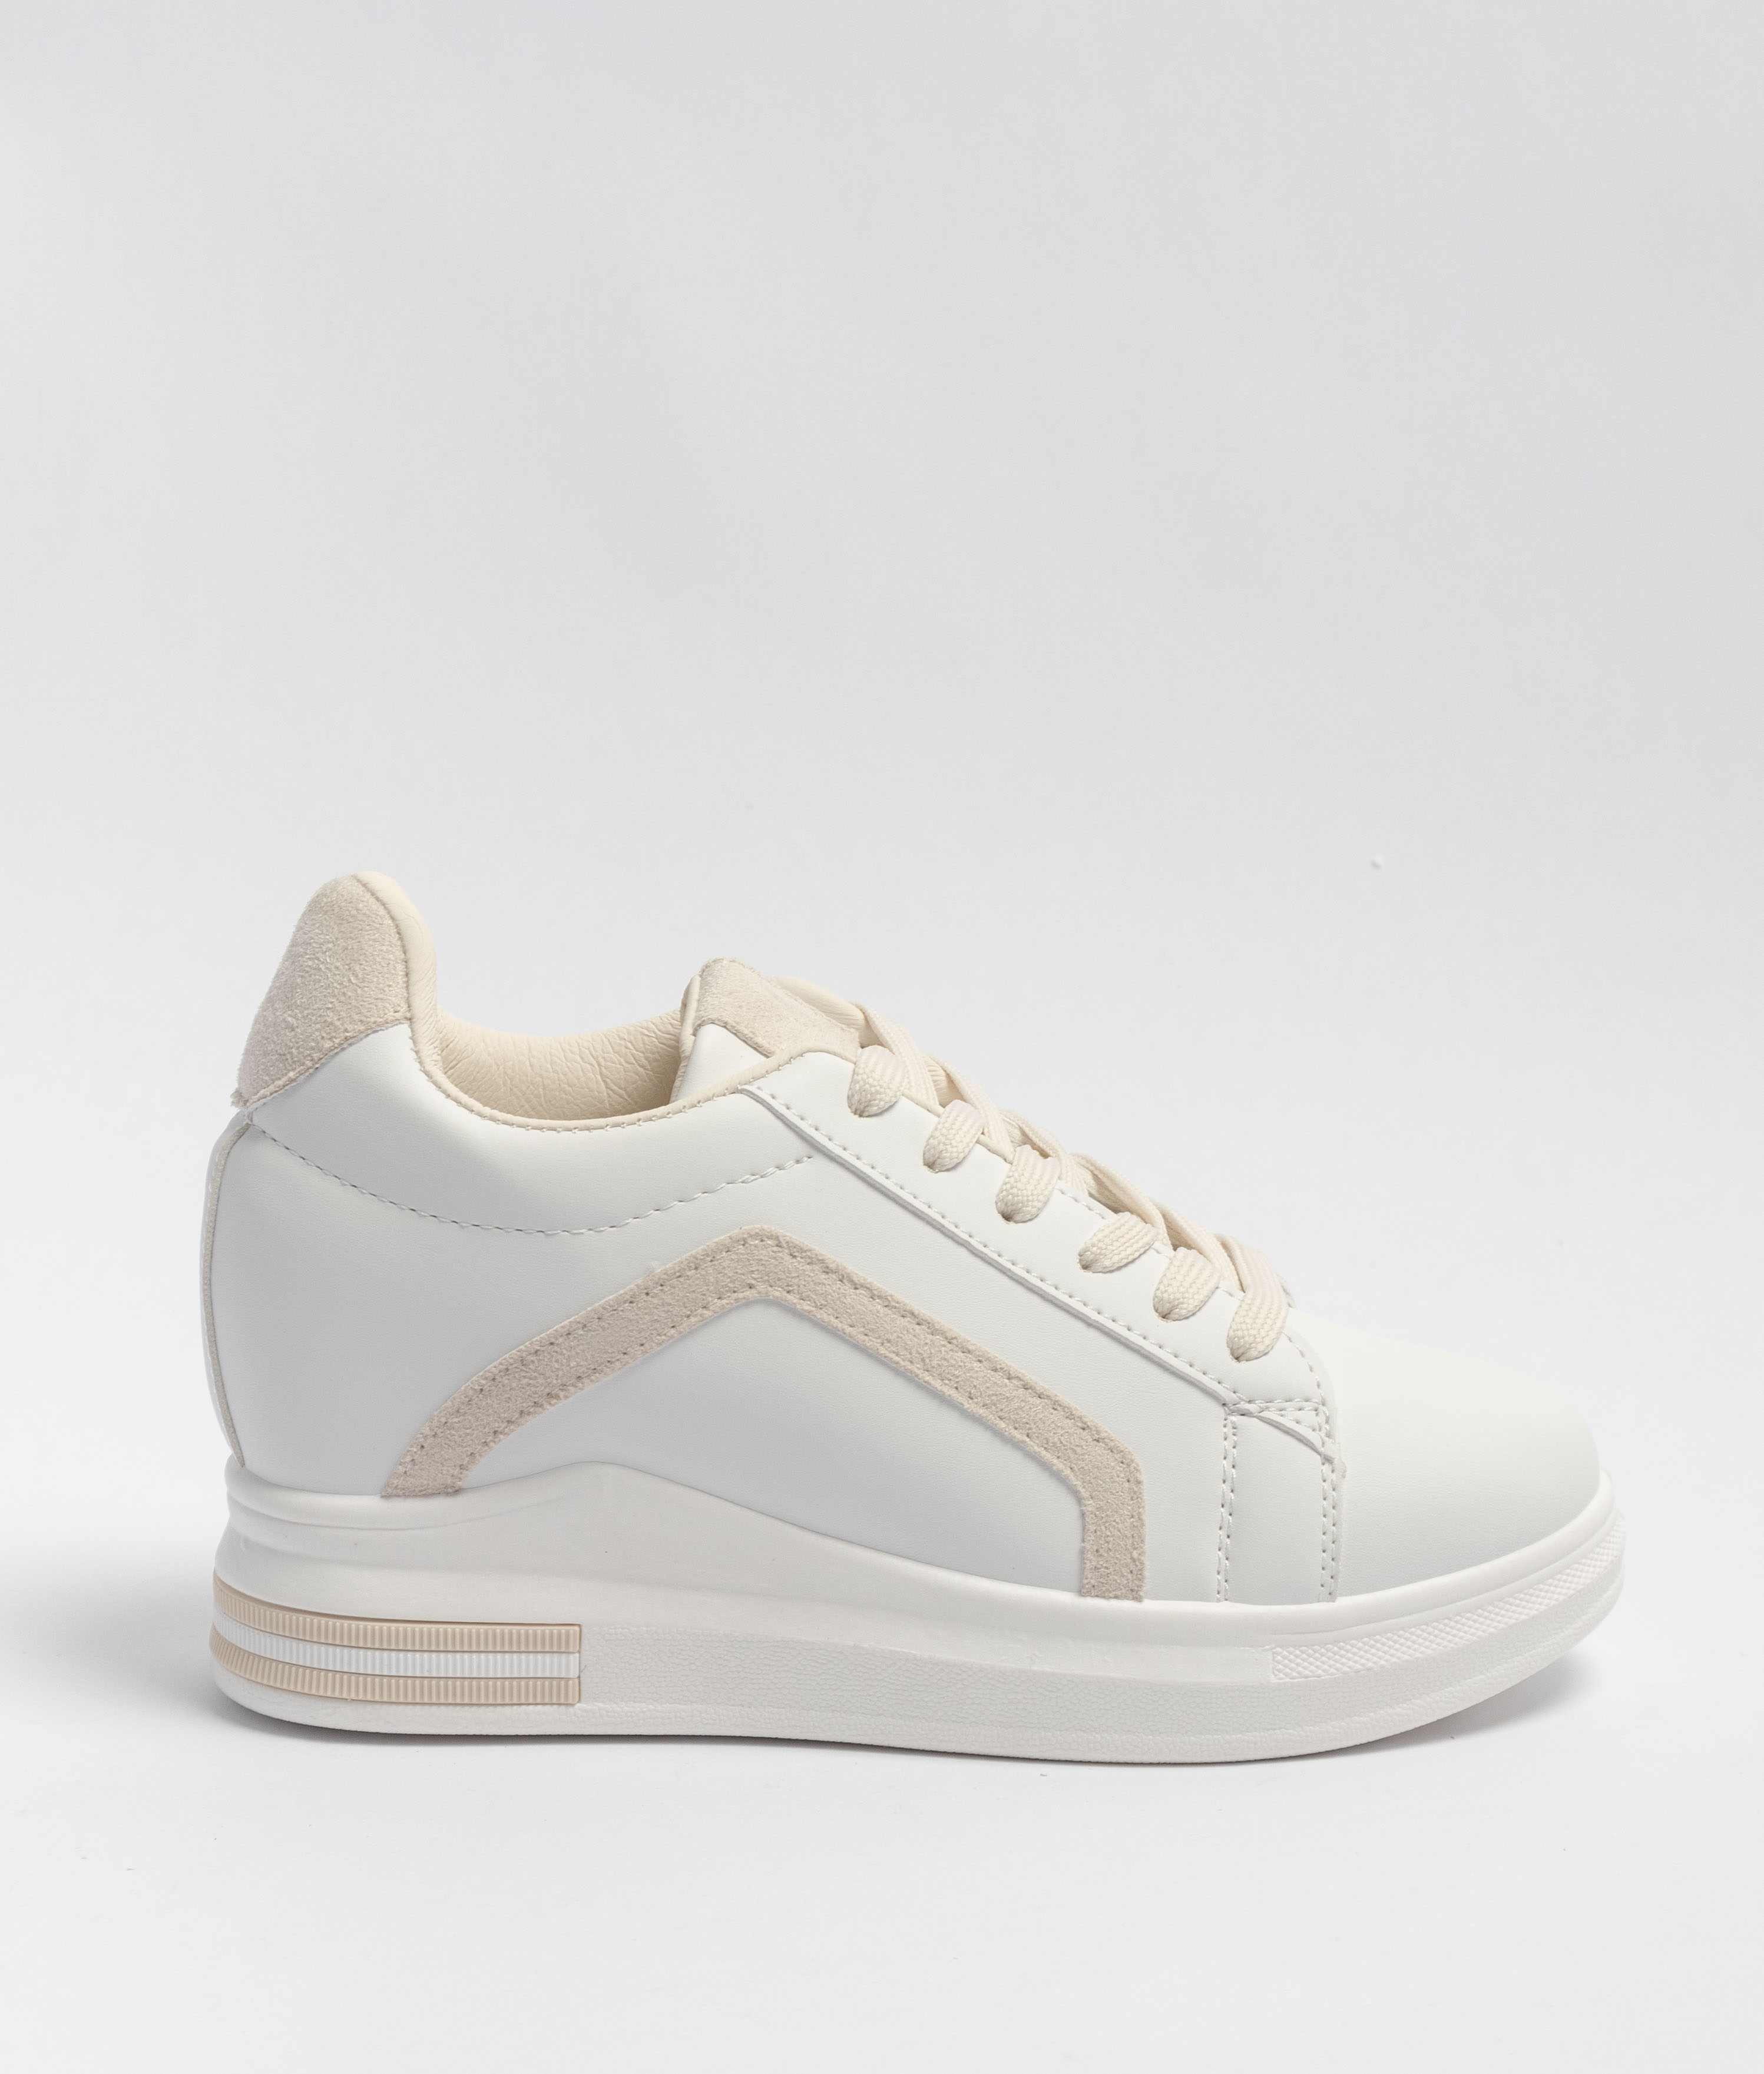 Sneakers Estar - Bege